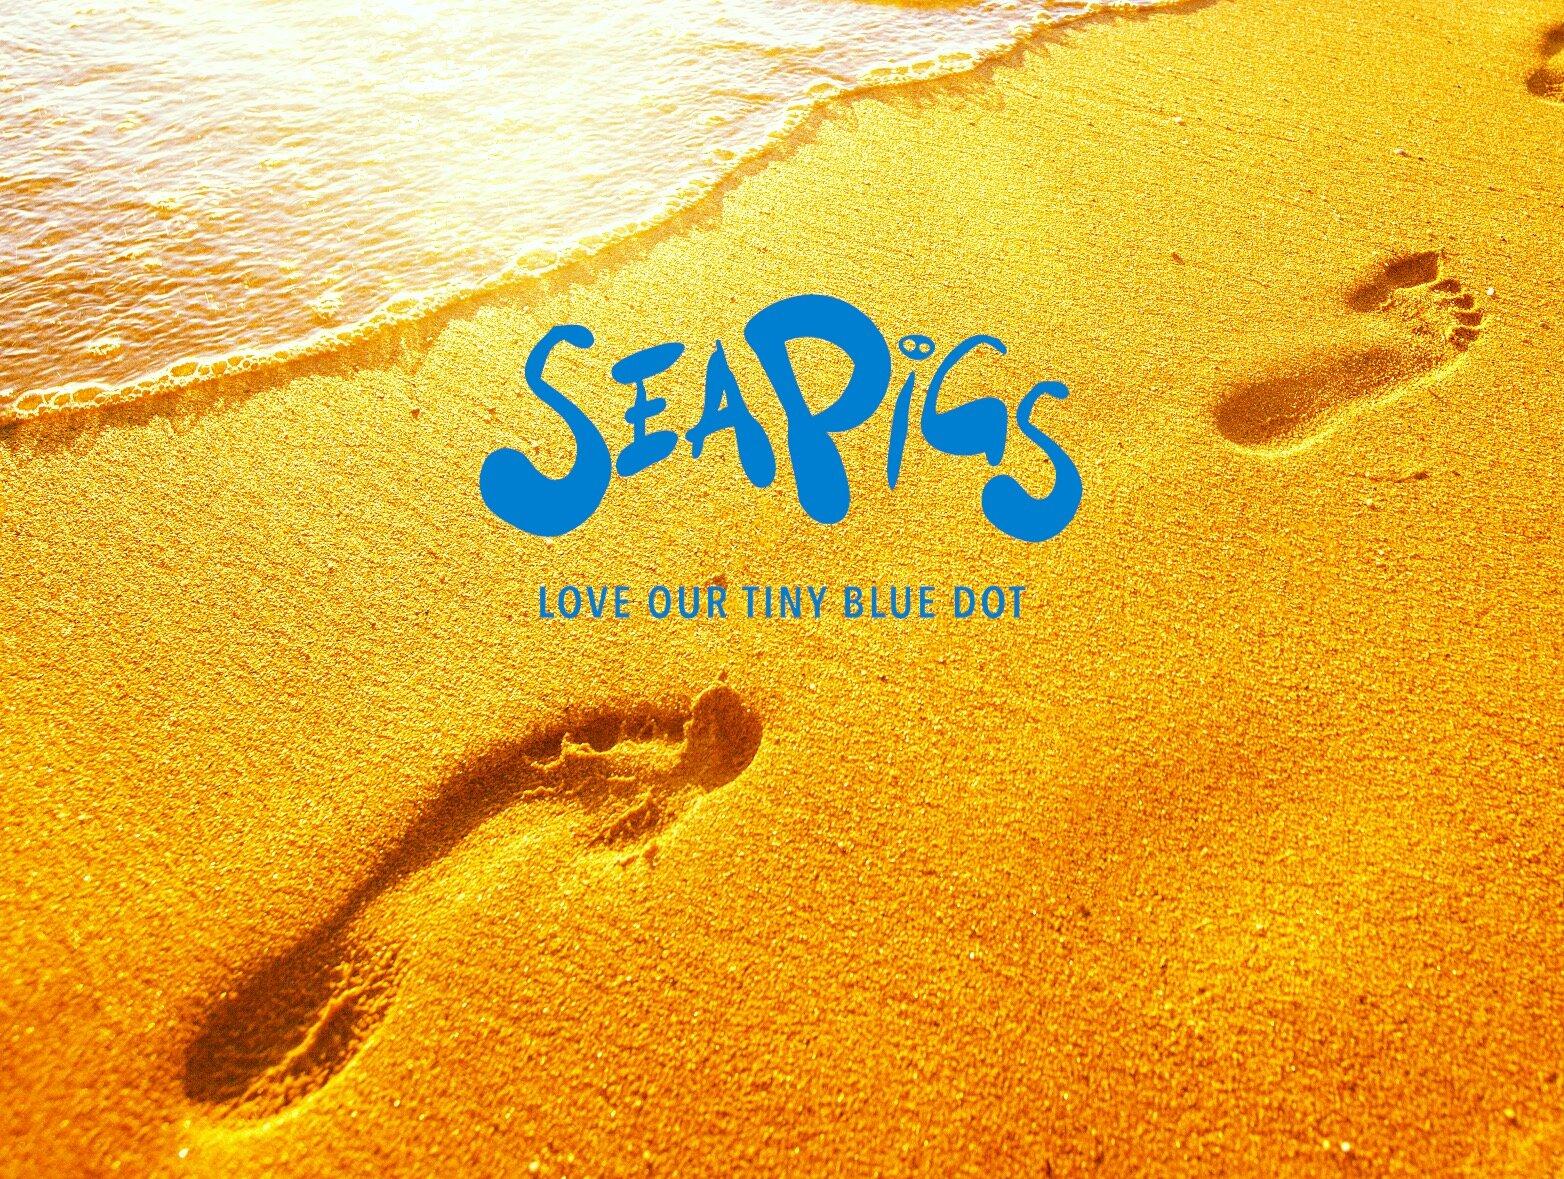 SeaPigs - Leaving Positive Footprints